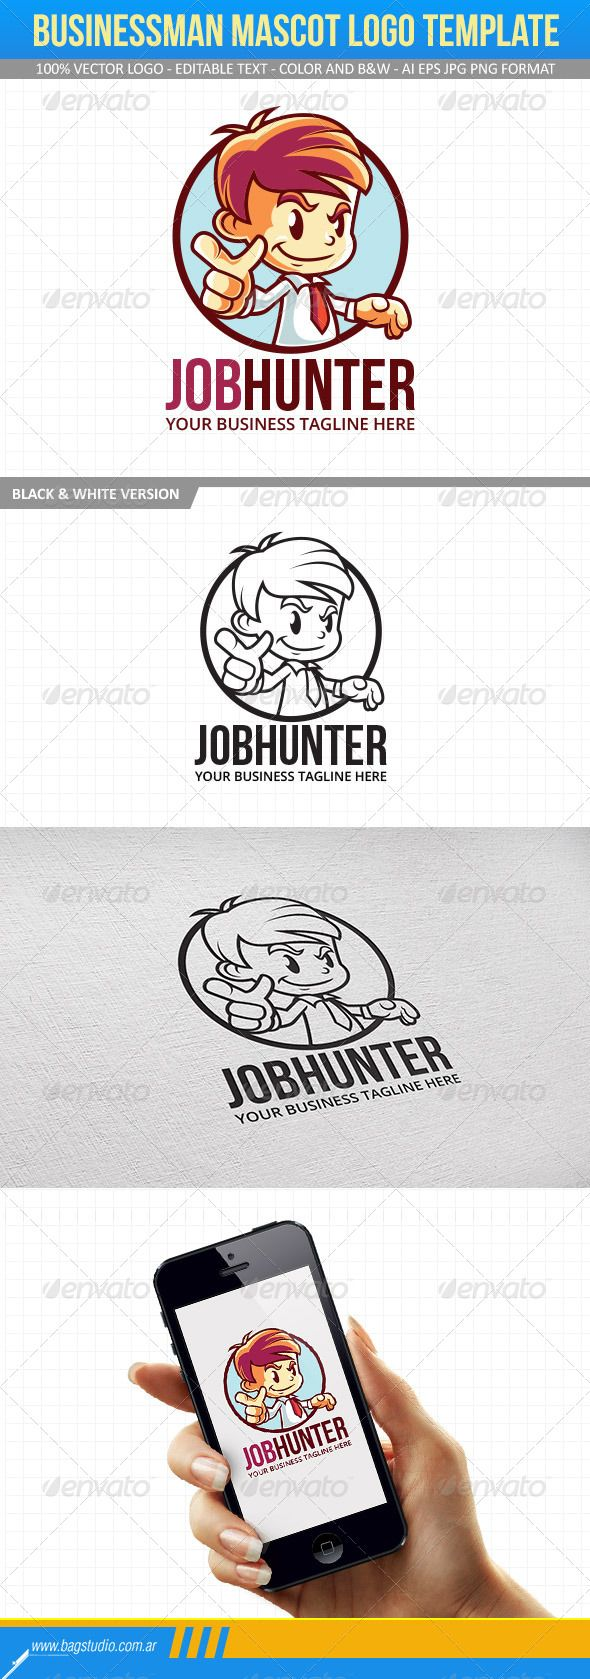 Businessman Mascot Logo Template | Logo templates, Template and Logos